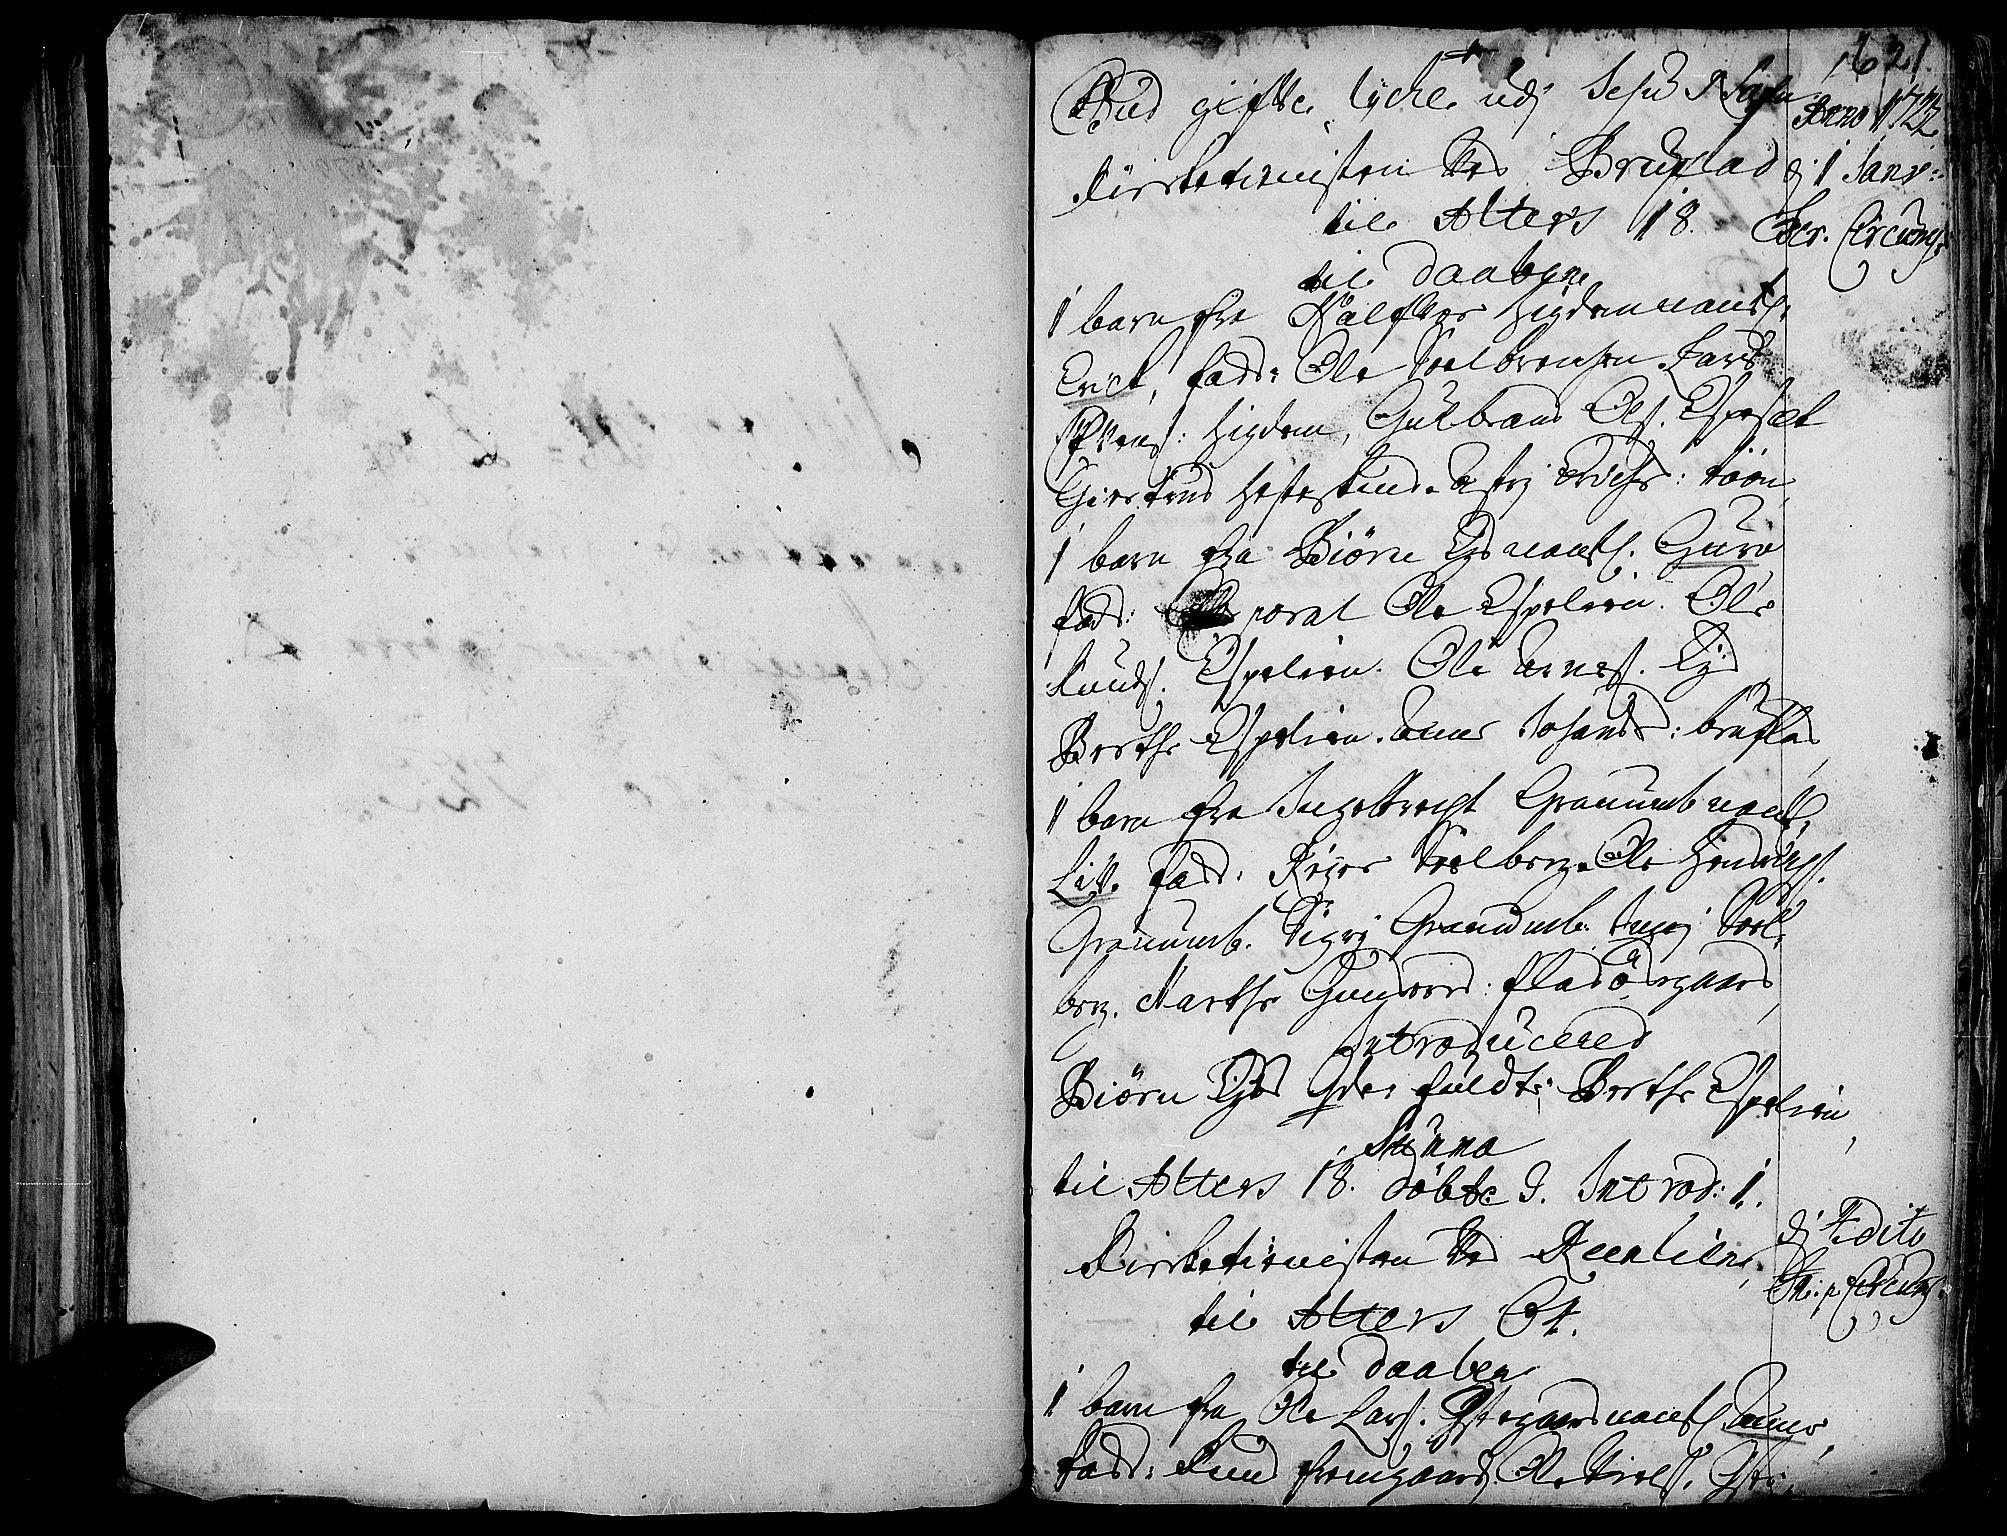 SAH, Aurdal prestekontor, Ministerialbok nr. 1-3, 1692-1730, s. 621